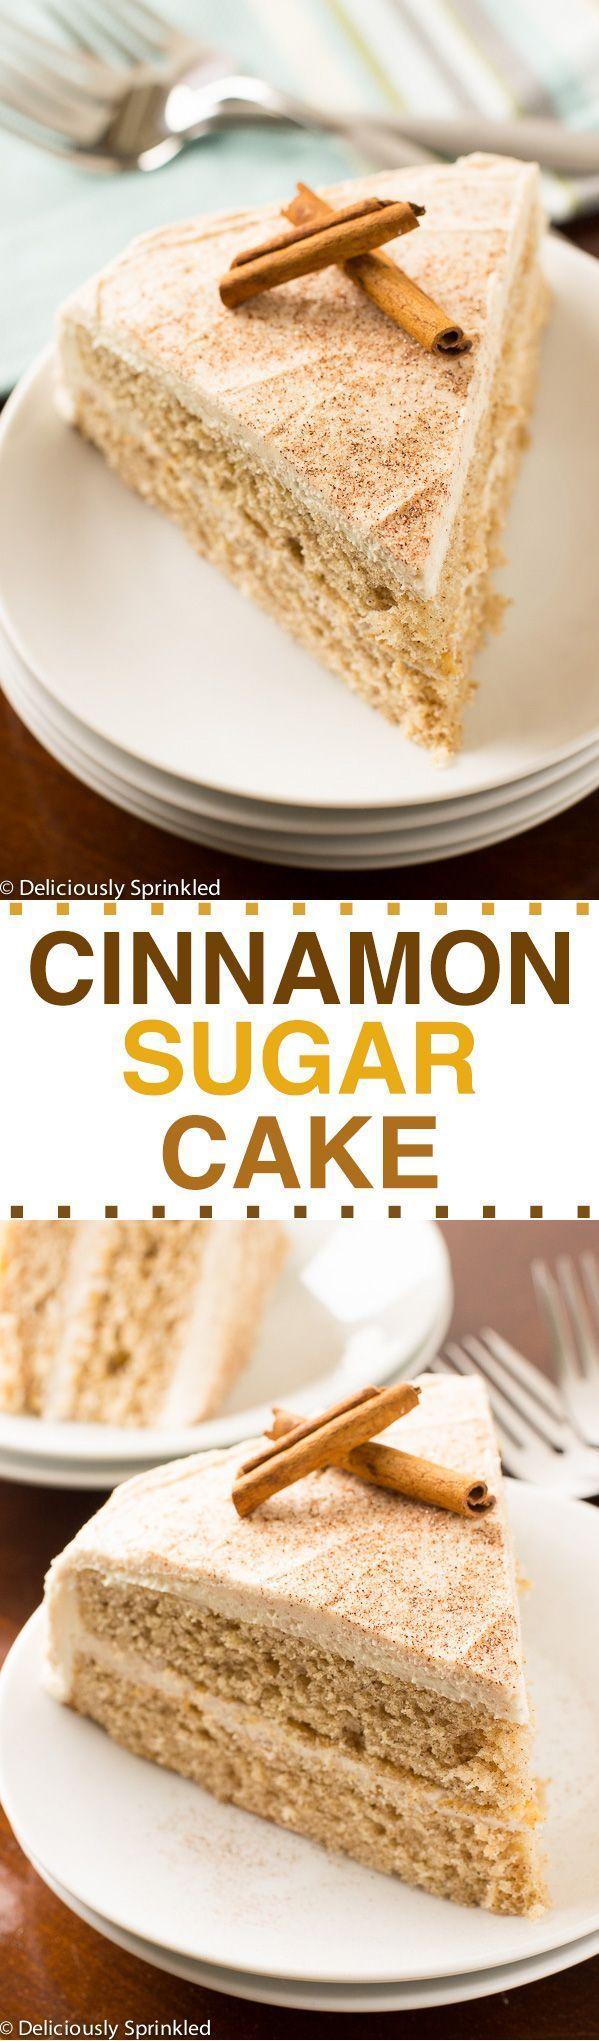 The BEST Cinnamon-Sugar Cake Recipe